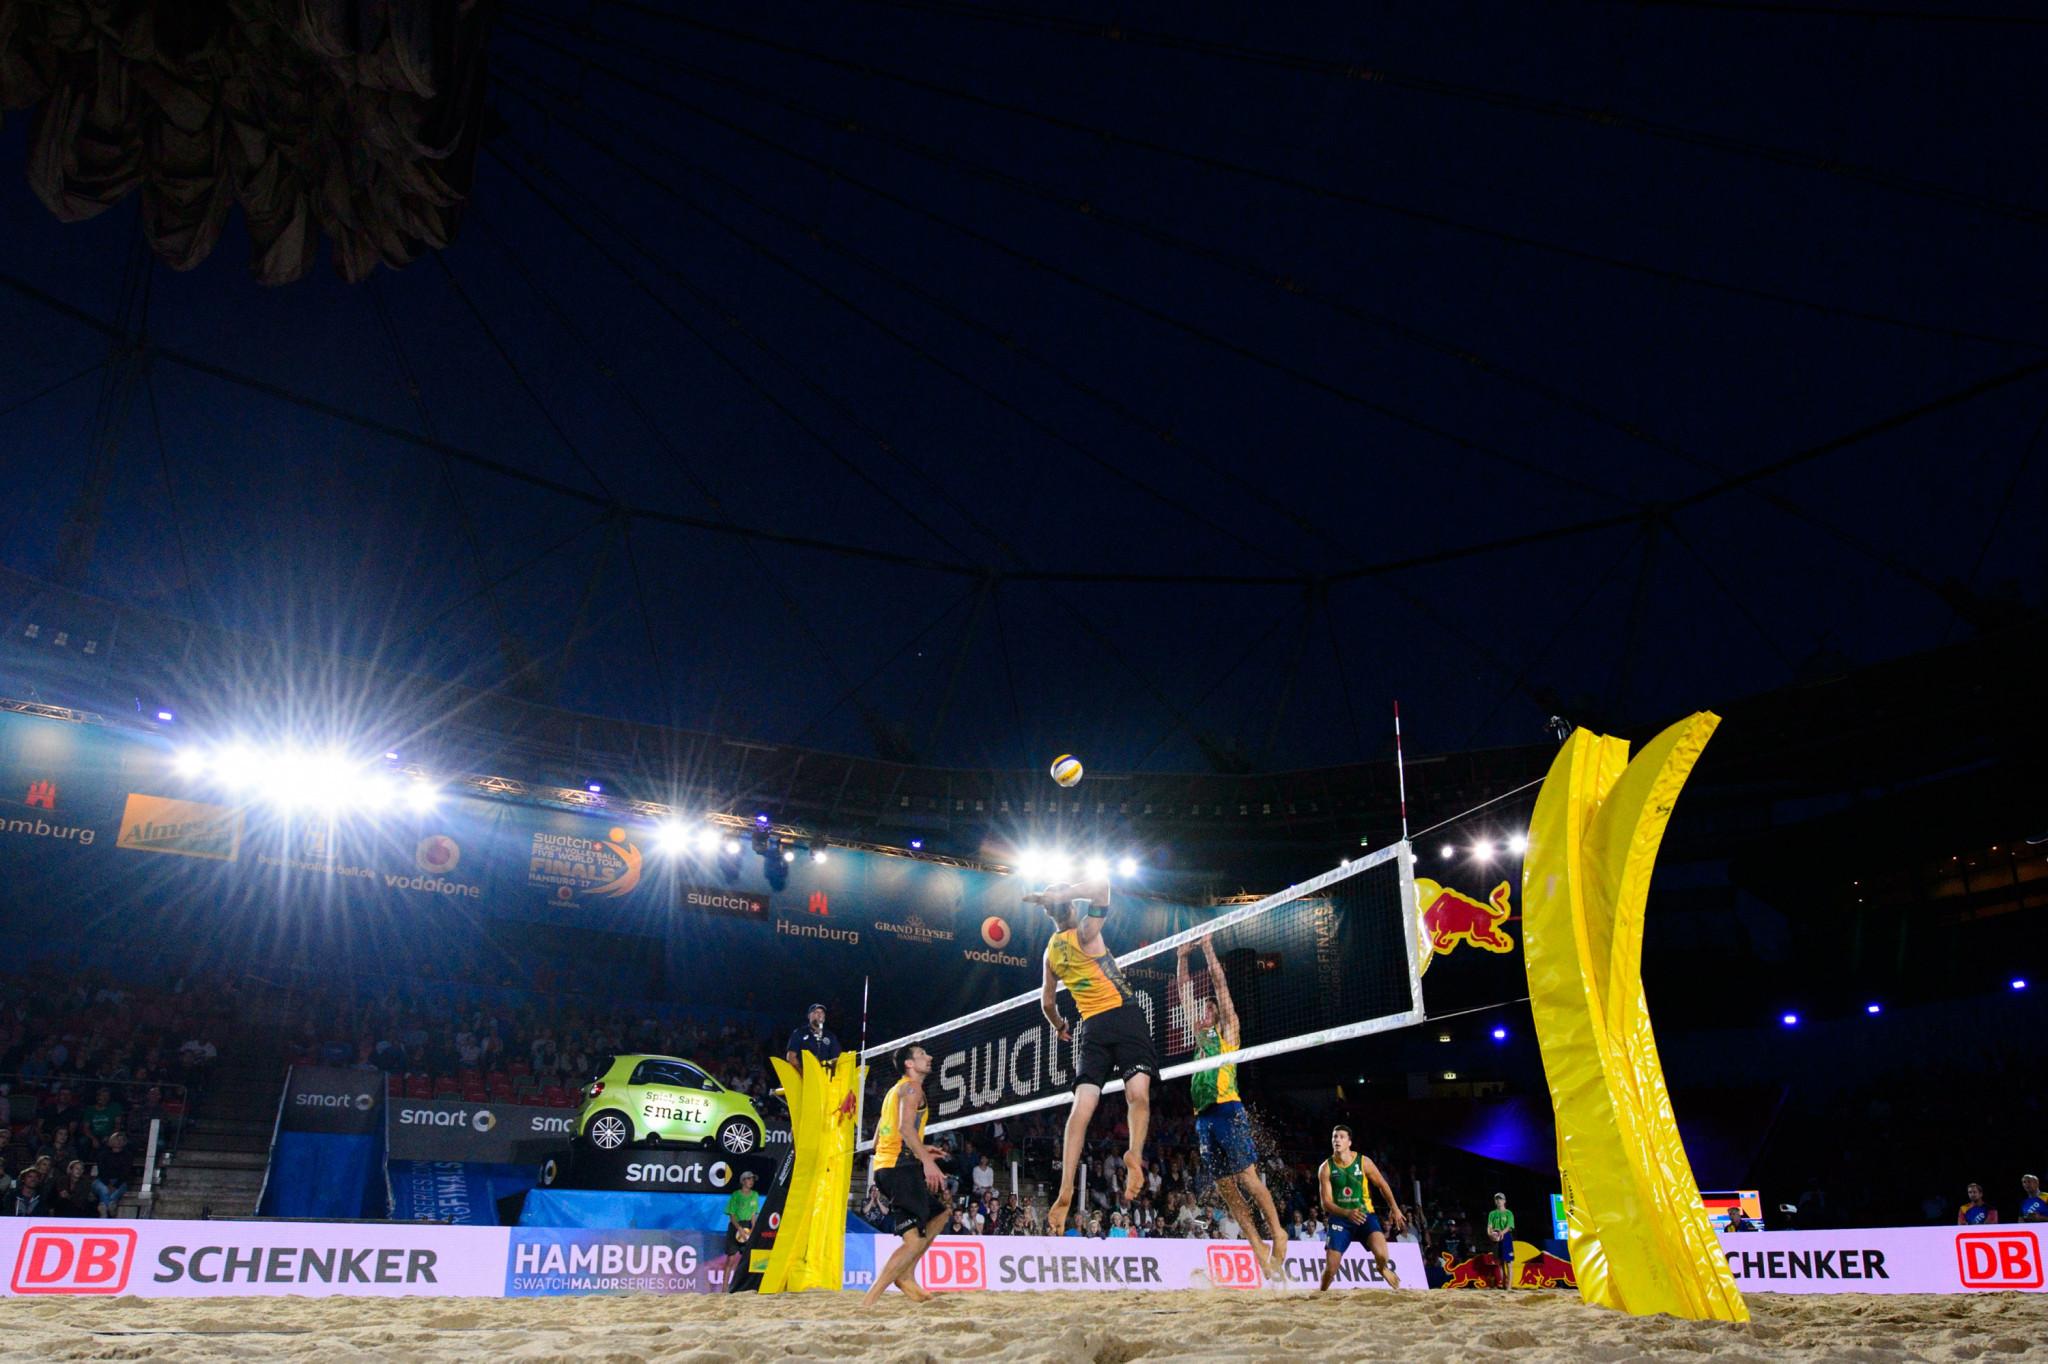 hamburg set for fivb beach volleyball world tour finals. Black Bedroom Furniture Sets. Home Design Ideas